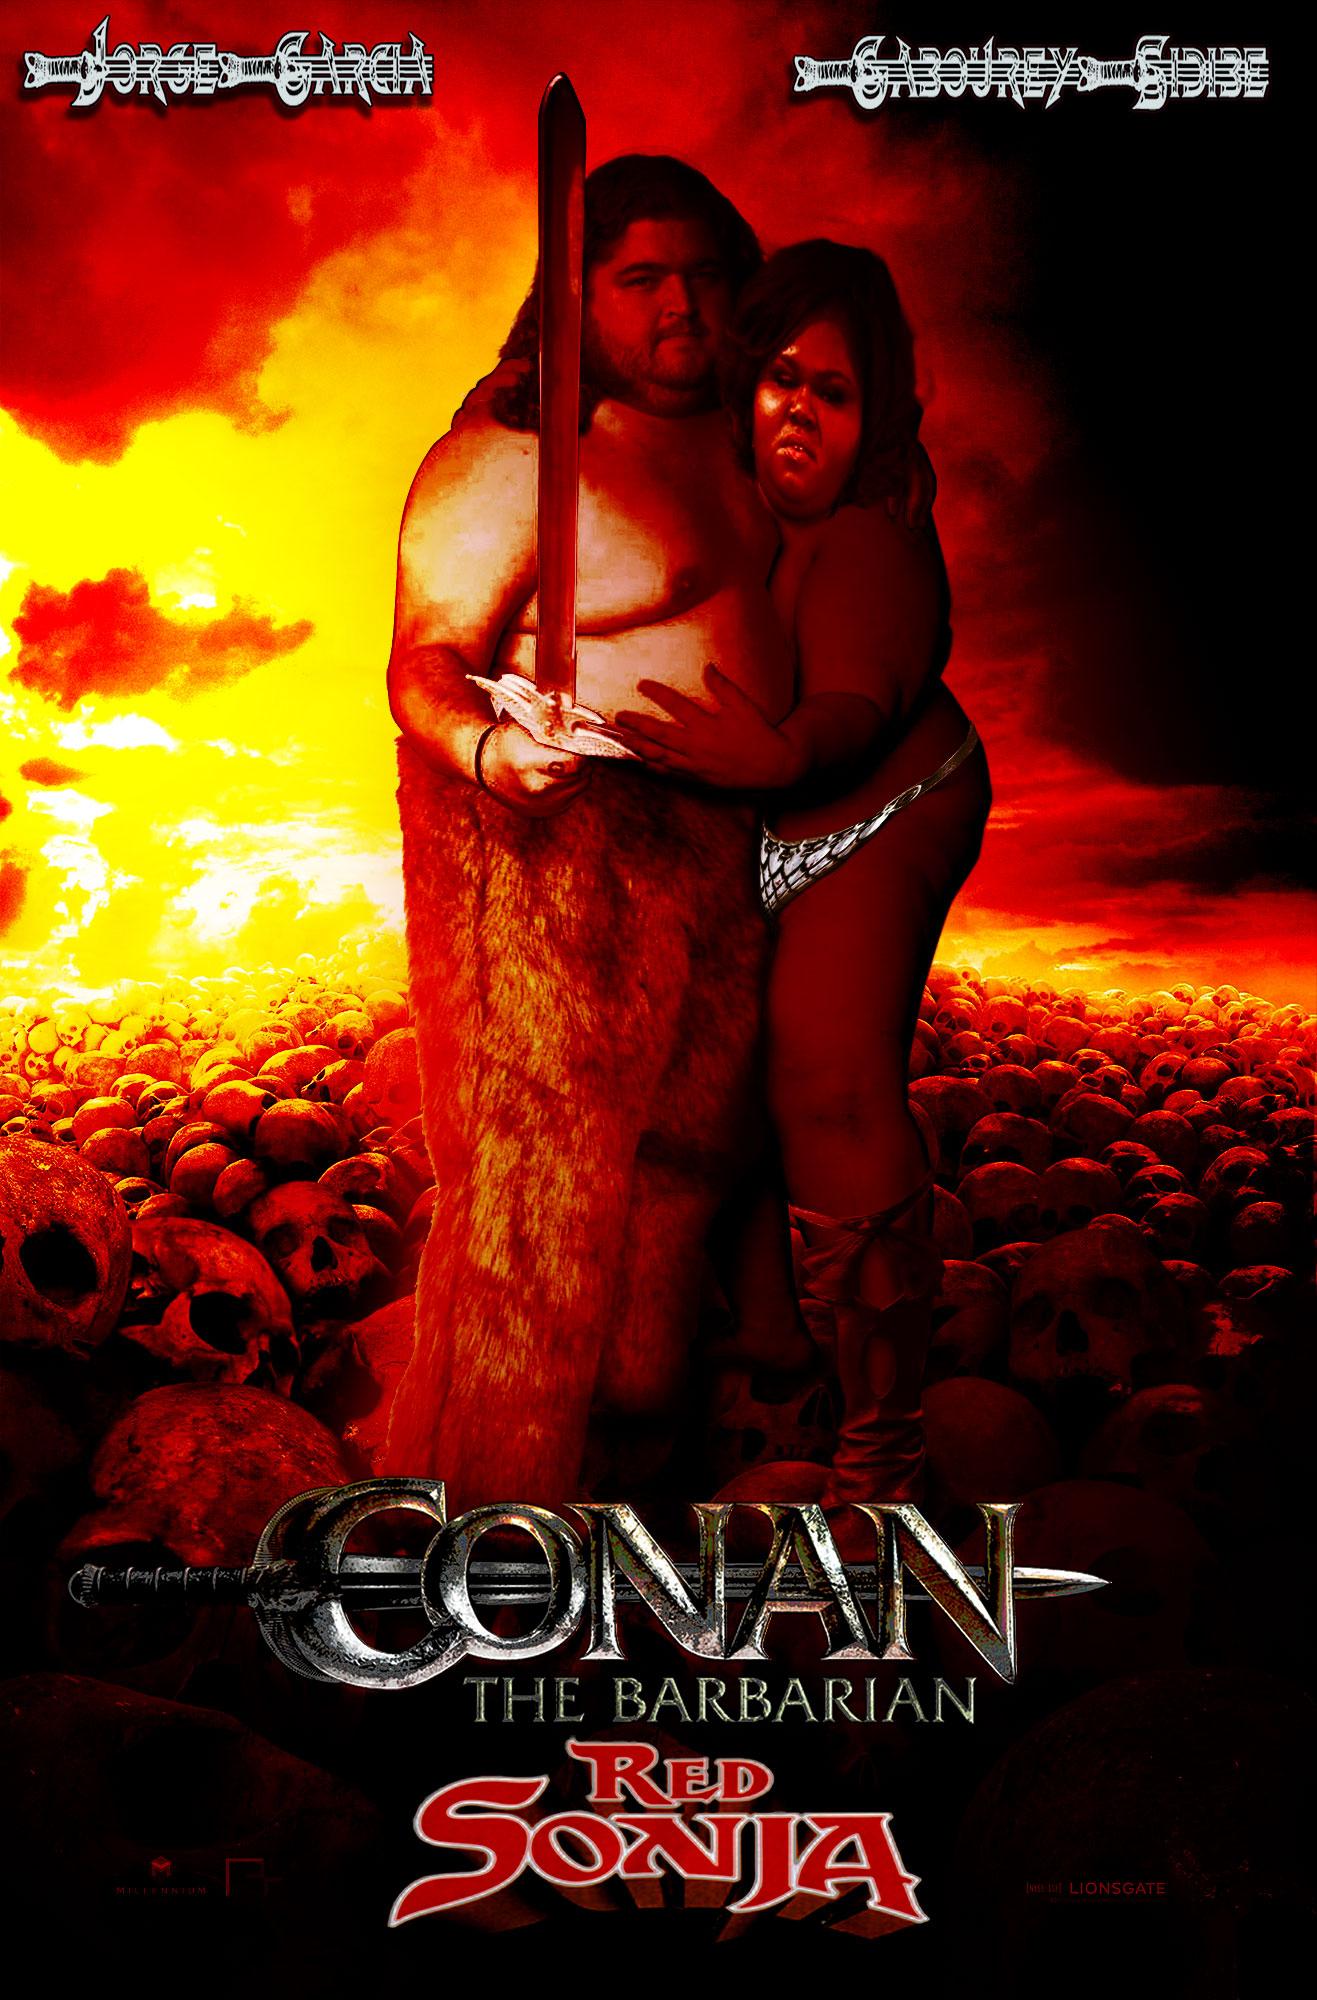 Bad Casting 4: Conan & Red Sonja